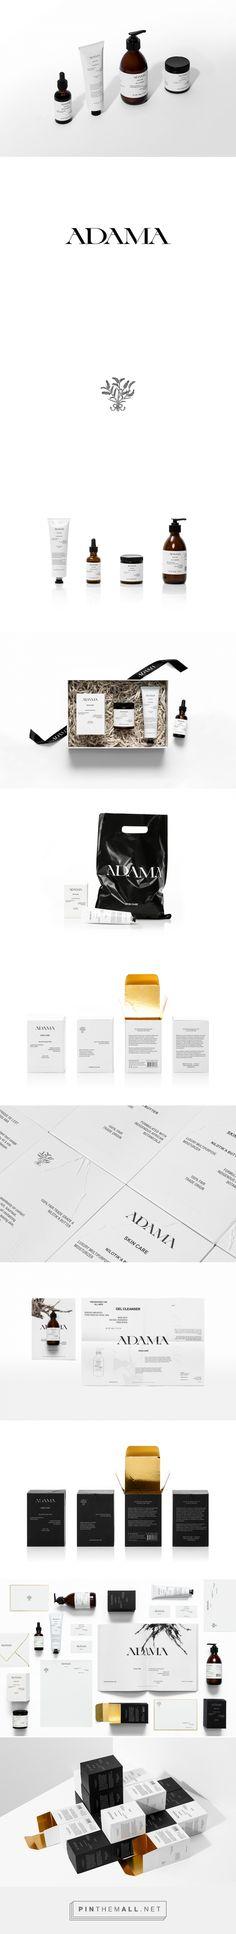 Adama skincare packaging design by Anagrama (Mexico) - http://www.packagingoftheworld.com/2016/09/adama.html